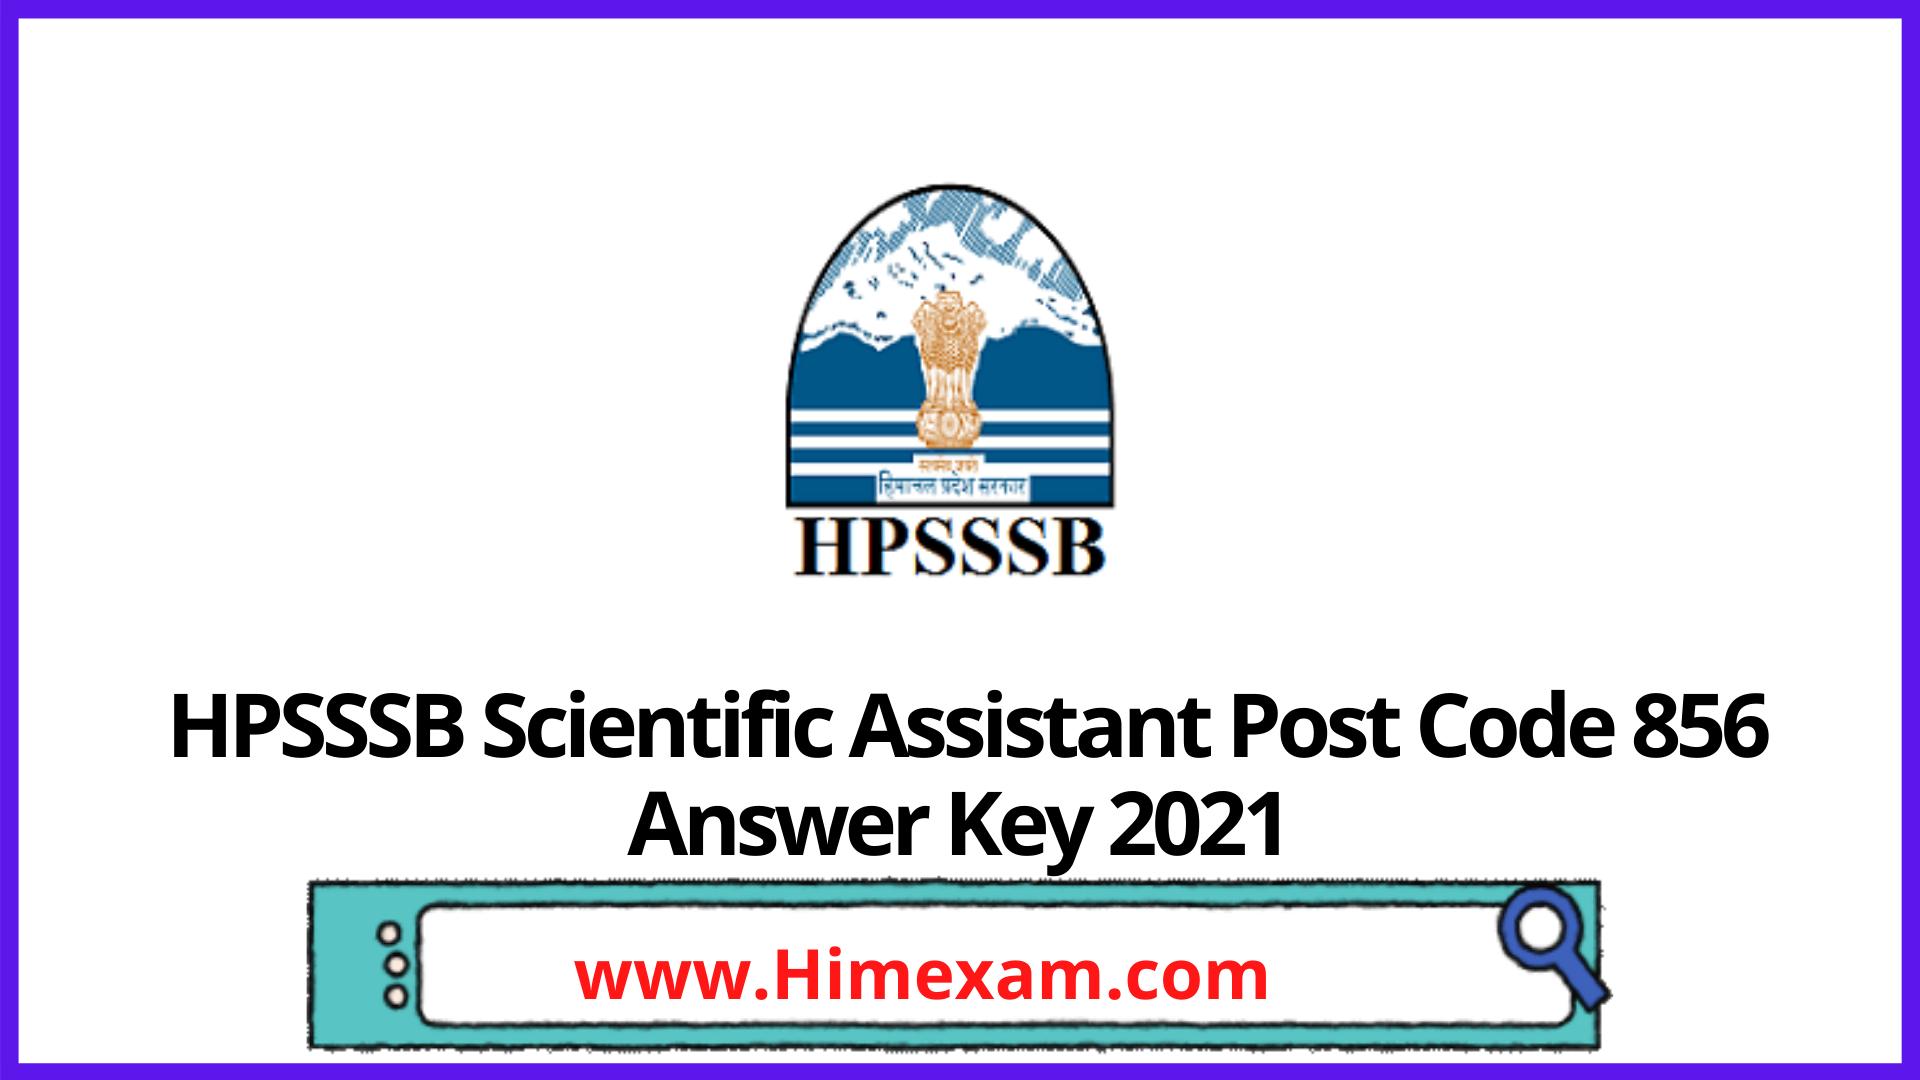 HPSSSB  Scientific Assistant Post Code 856 Answer Key 2021